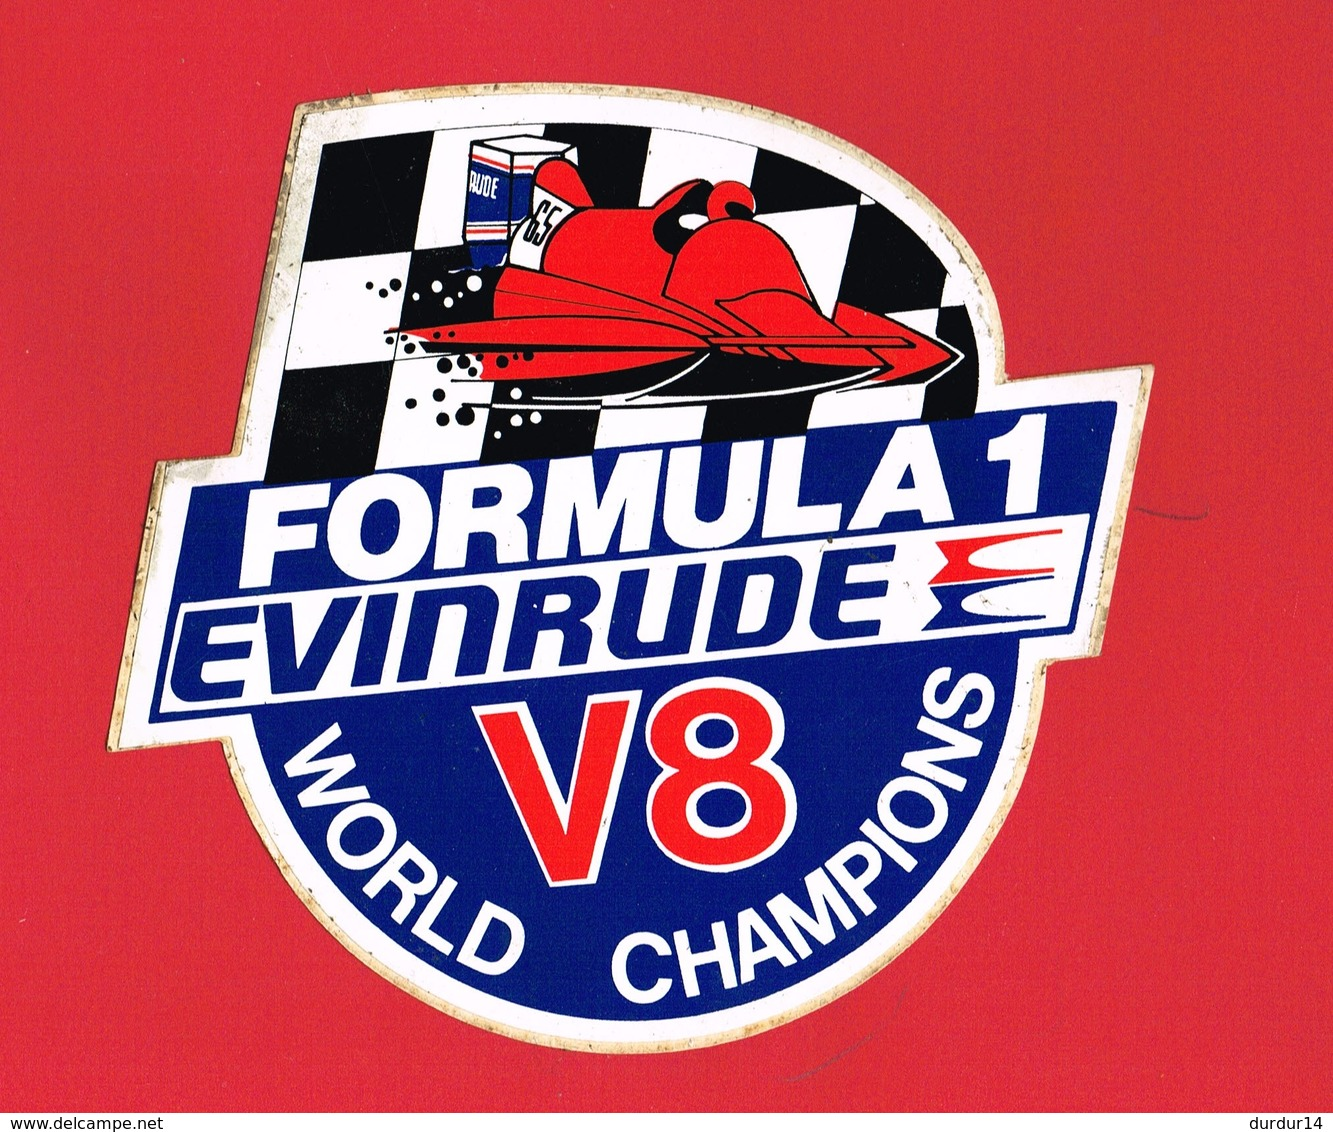 1 Autocollant FORMULA 1 EVINRUDE V8 - Autocollants